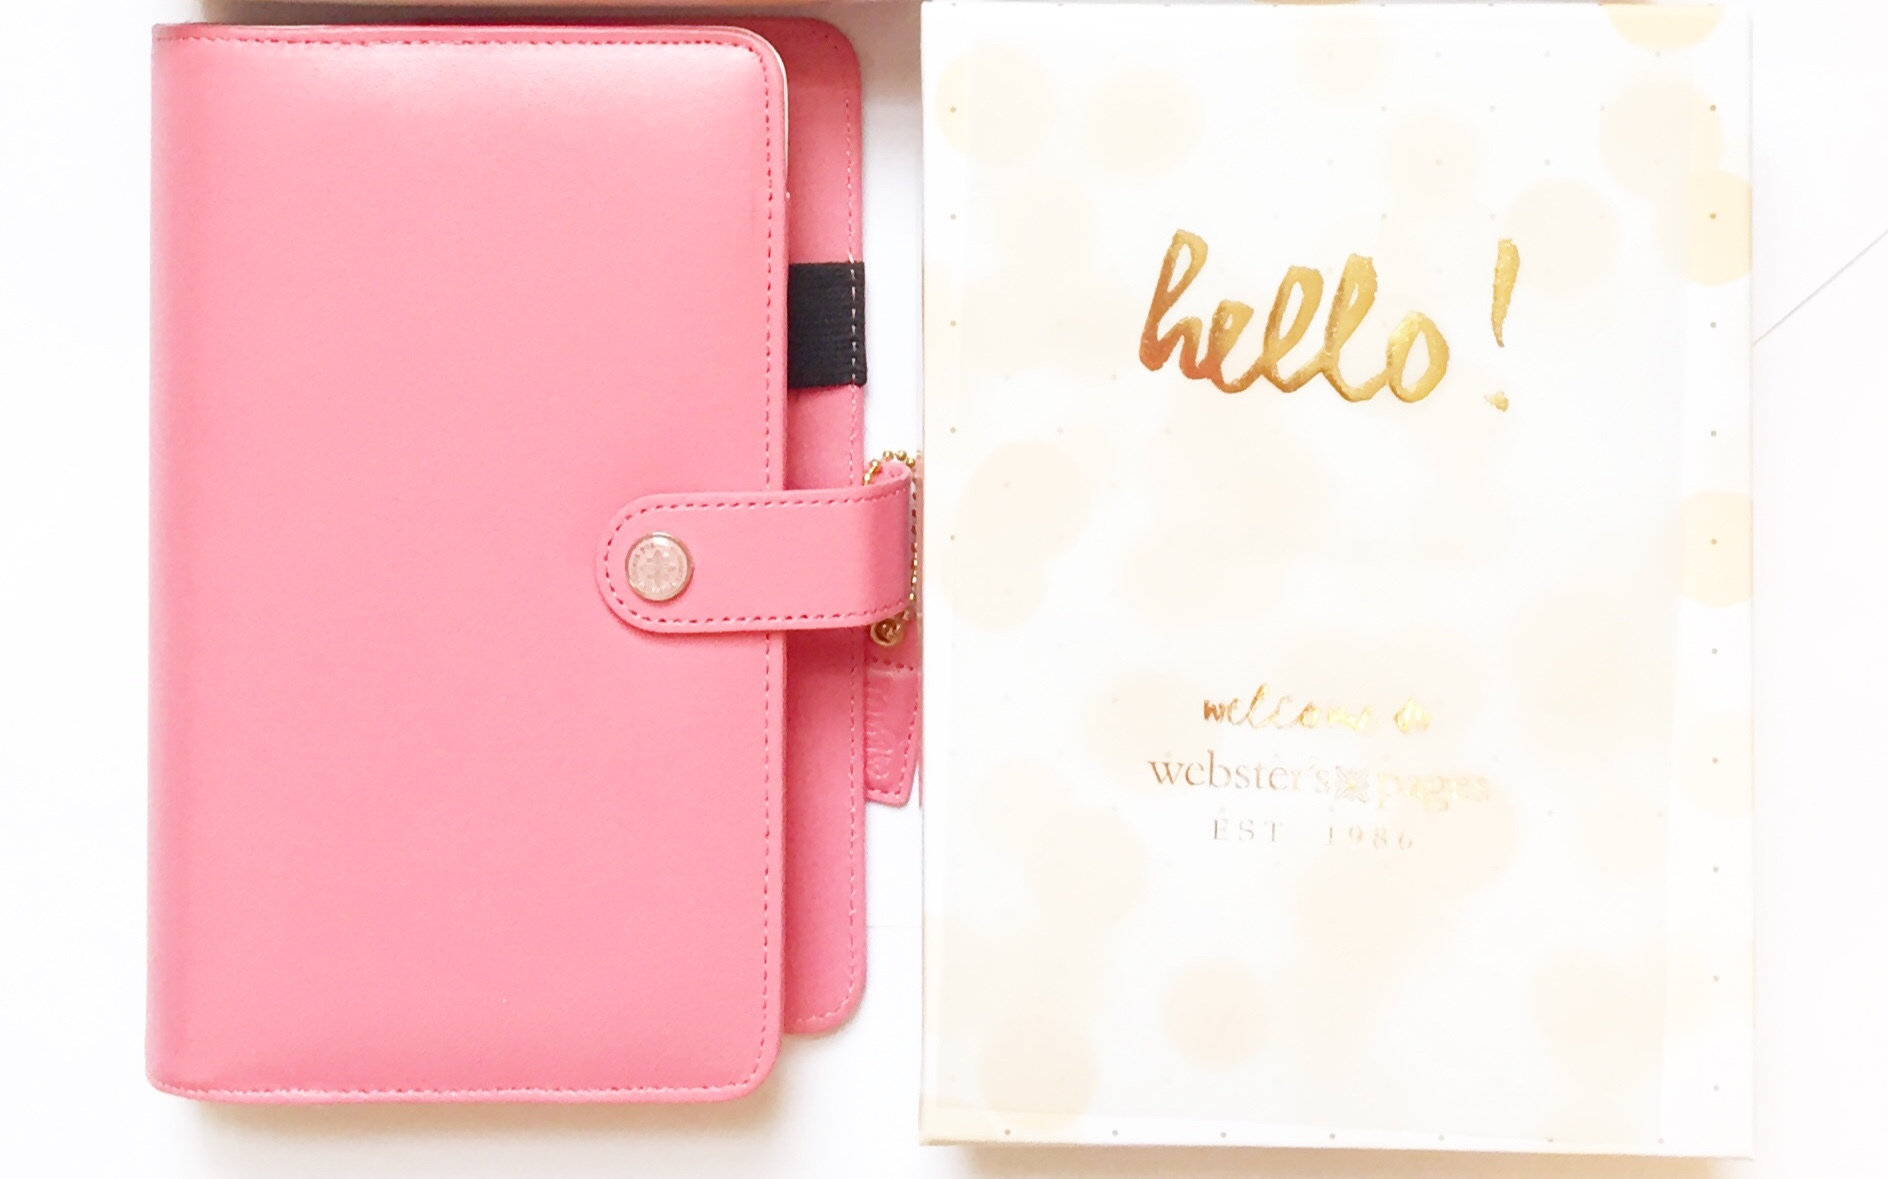 Планер PERSONAL PLANNER: Light Pink  by Websters Pages (БЕЗ внутреннего наполнения)